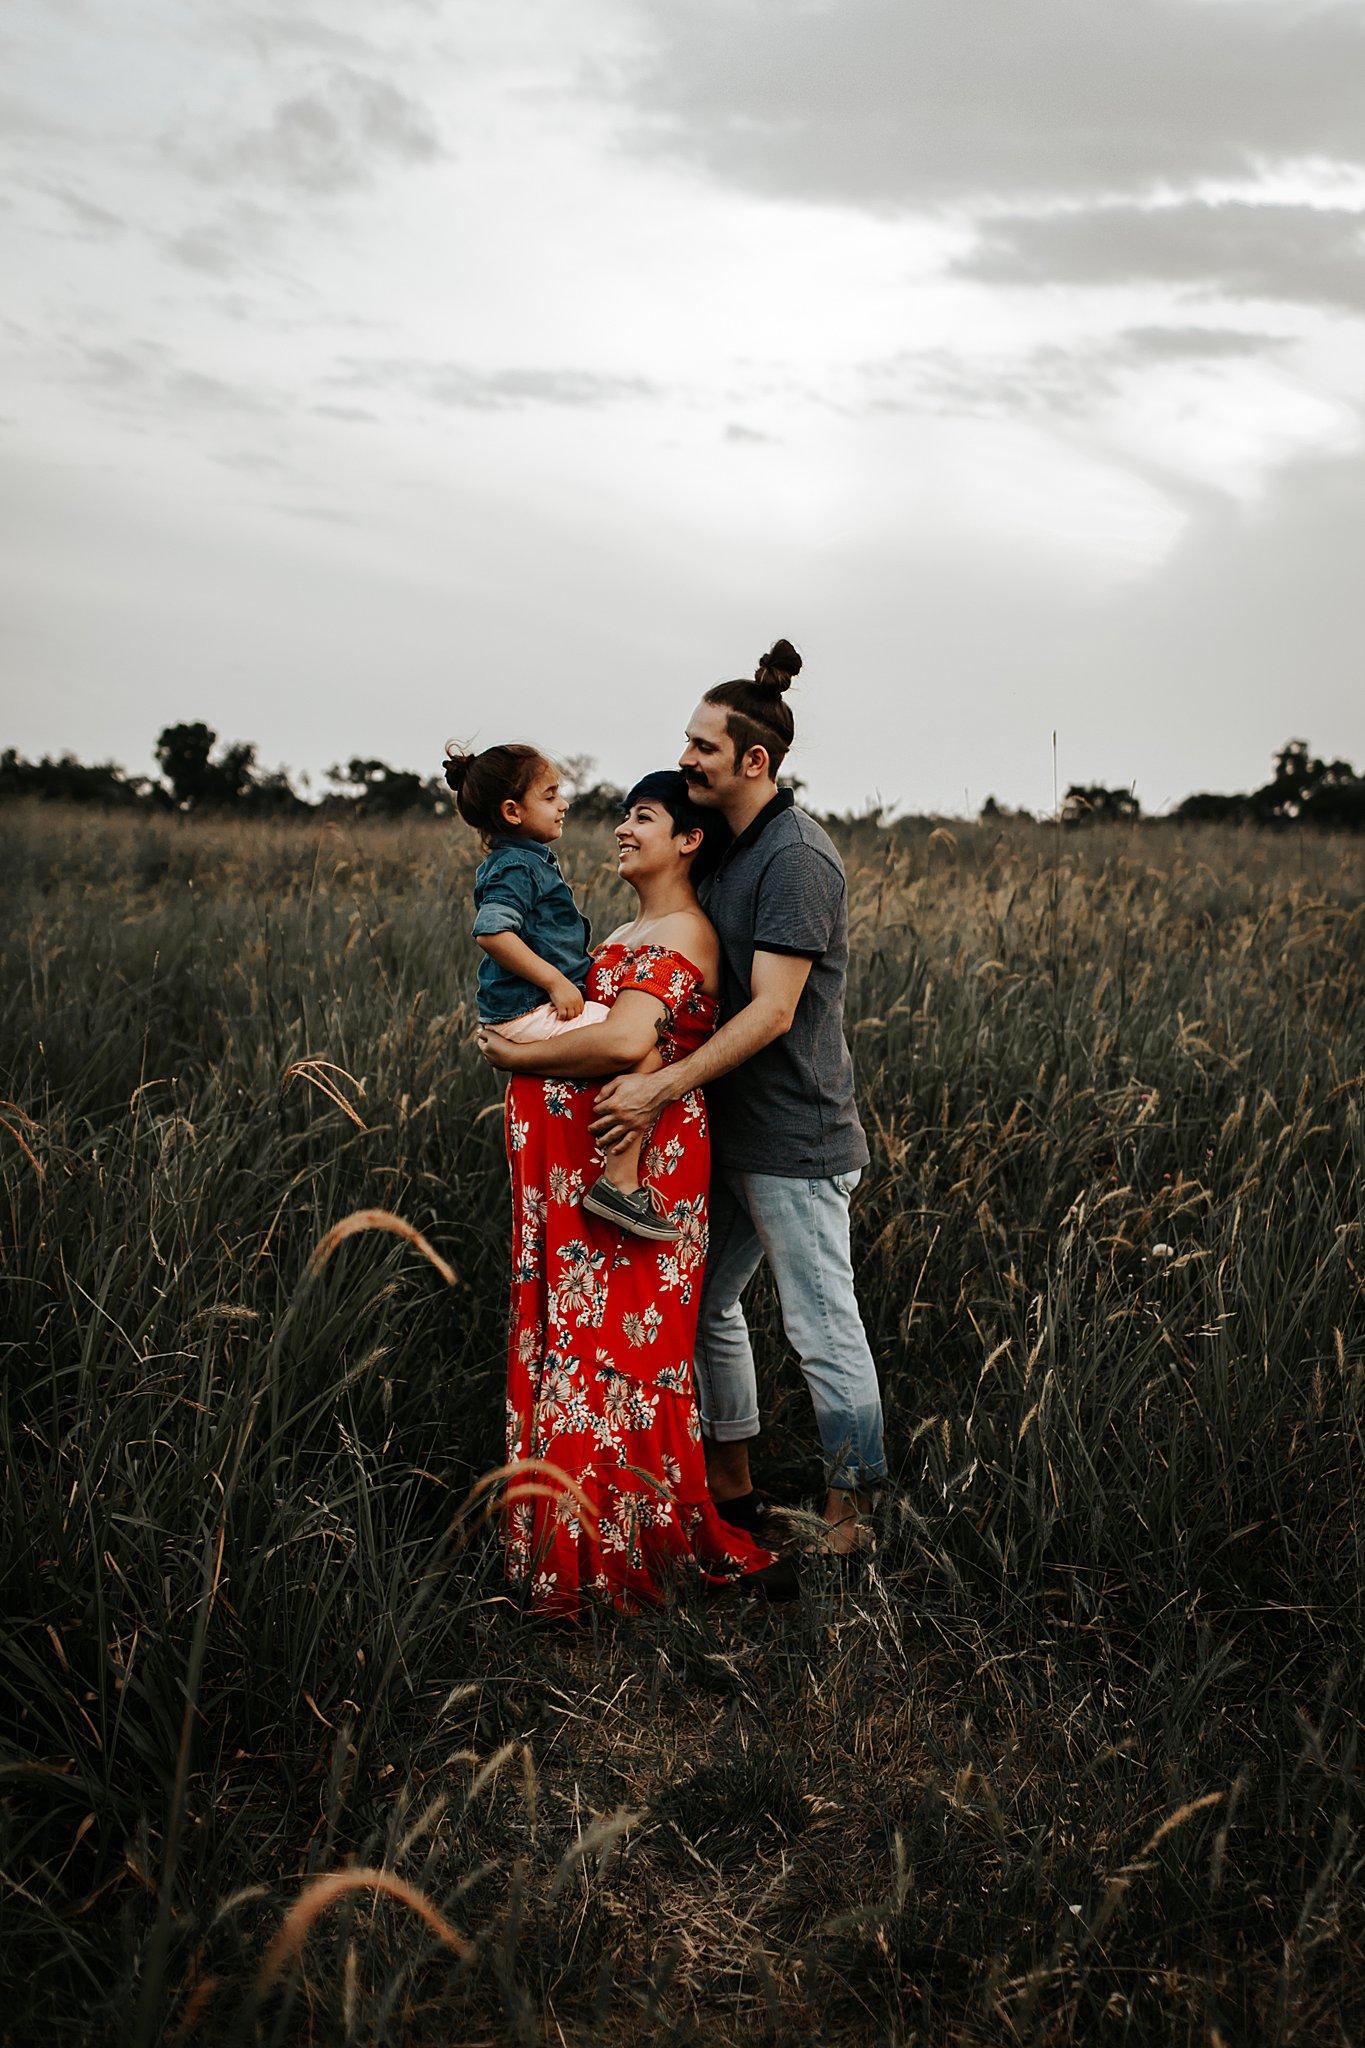 Meagan-San-Antonio-Maternity-Photographer-53_WEB.jpg